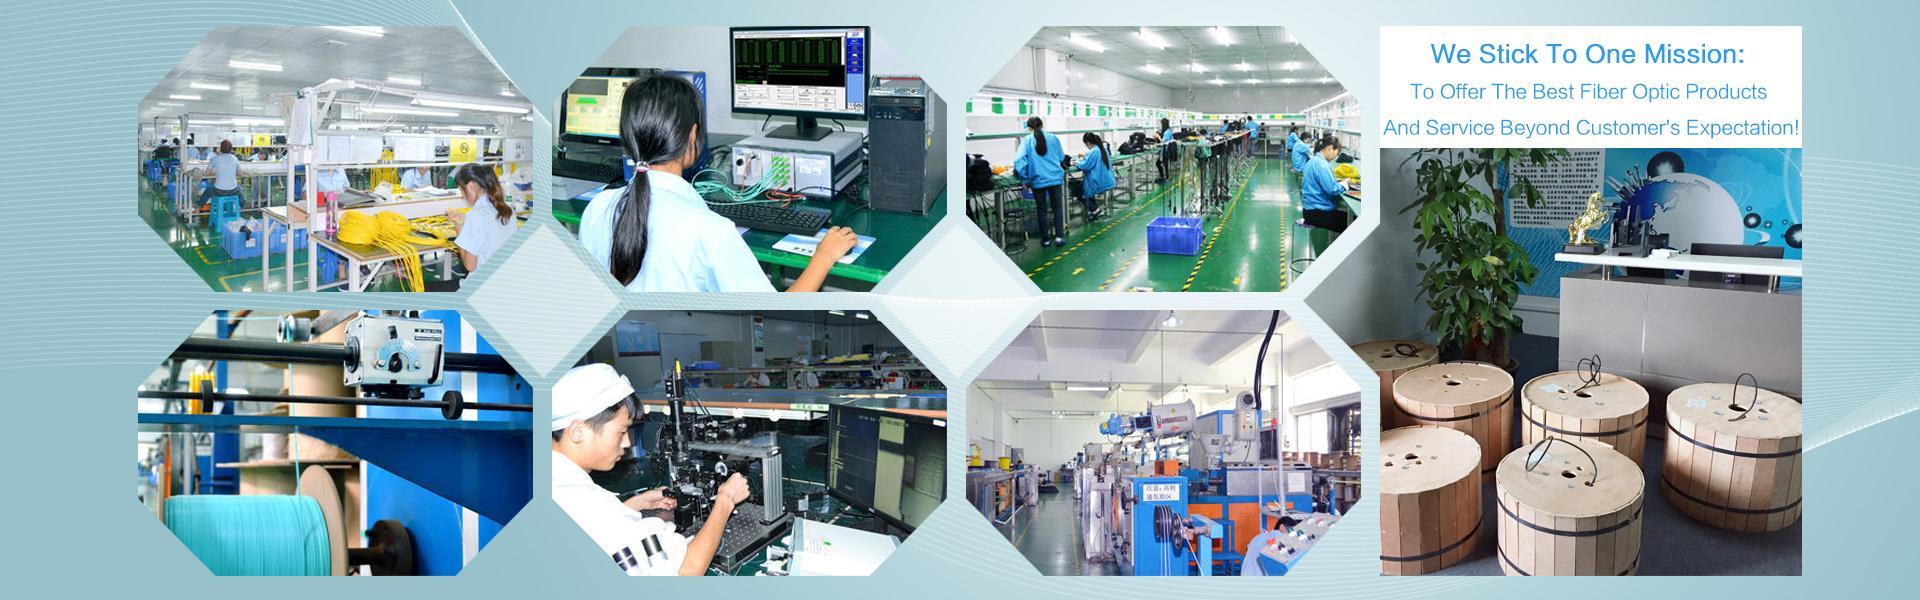 Fiber Optic Products Price